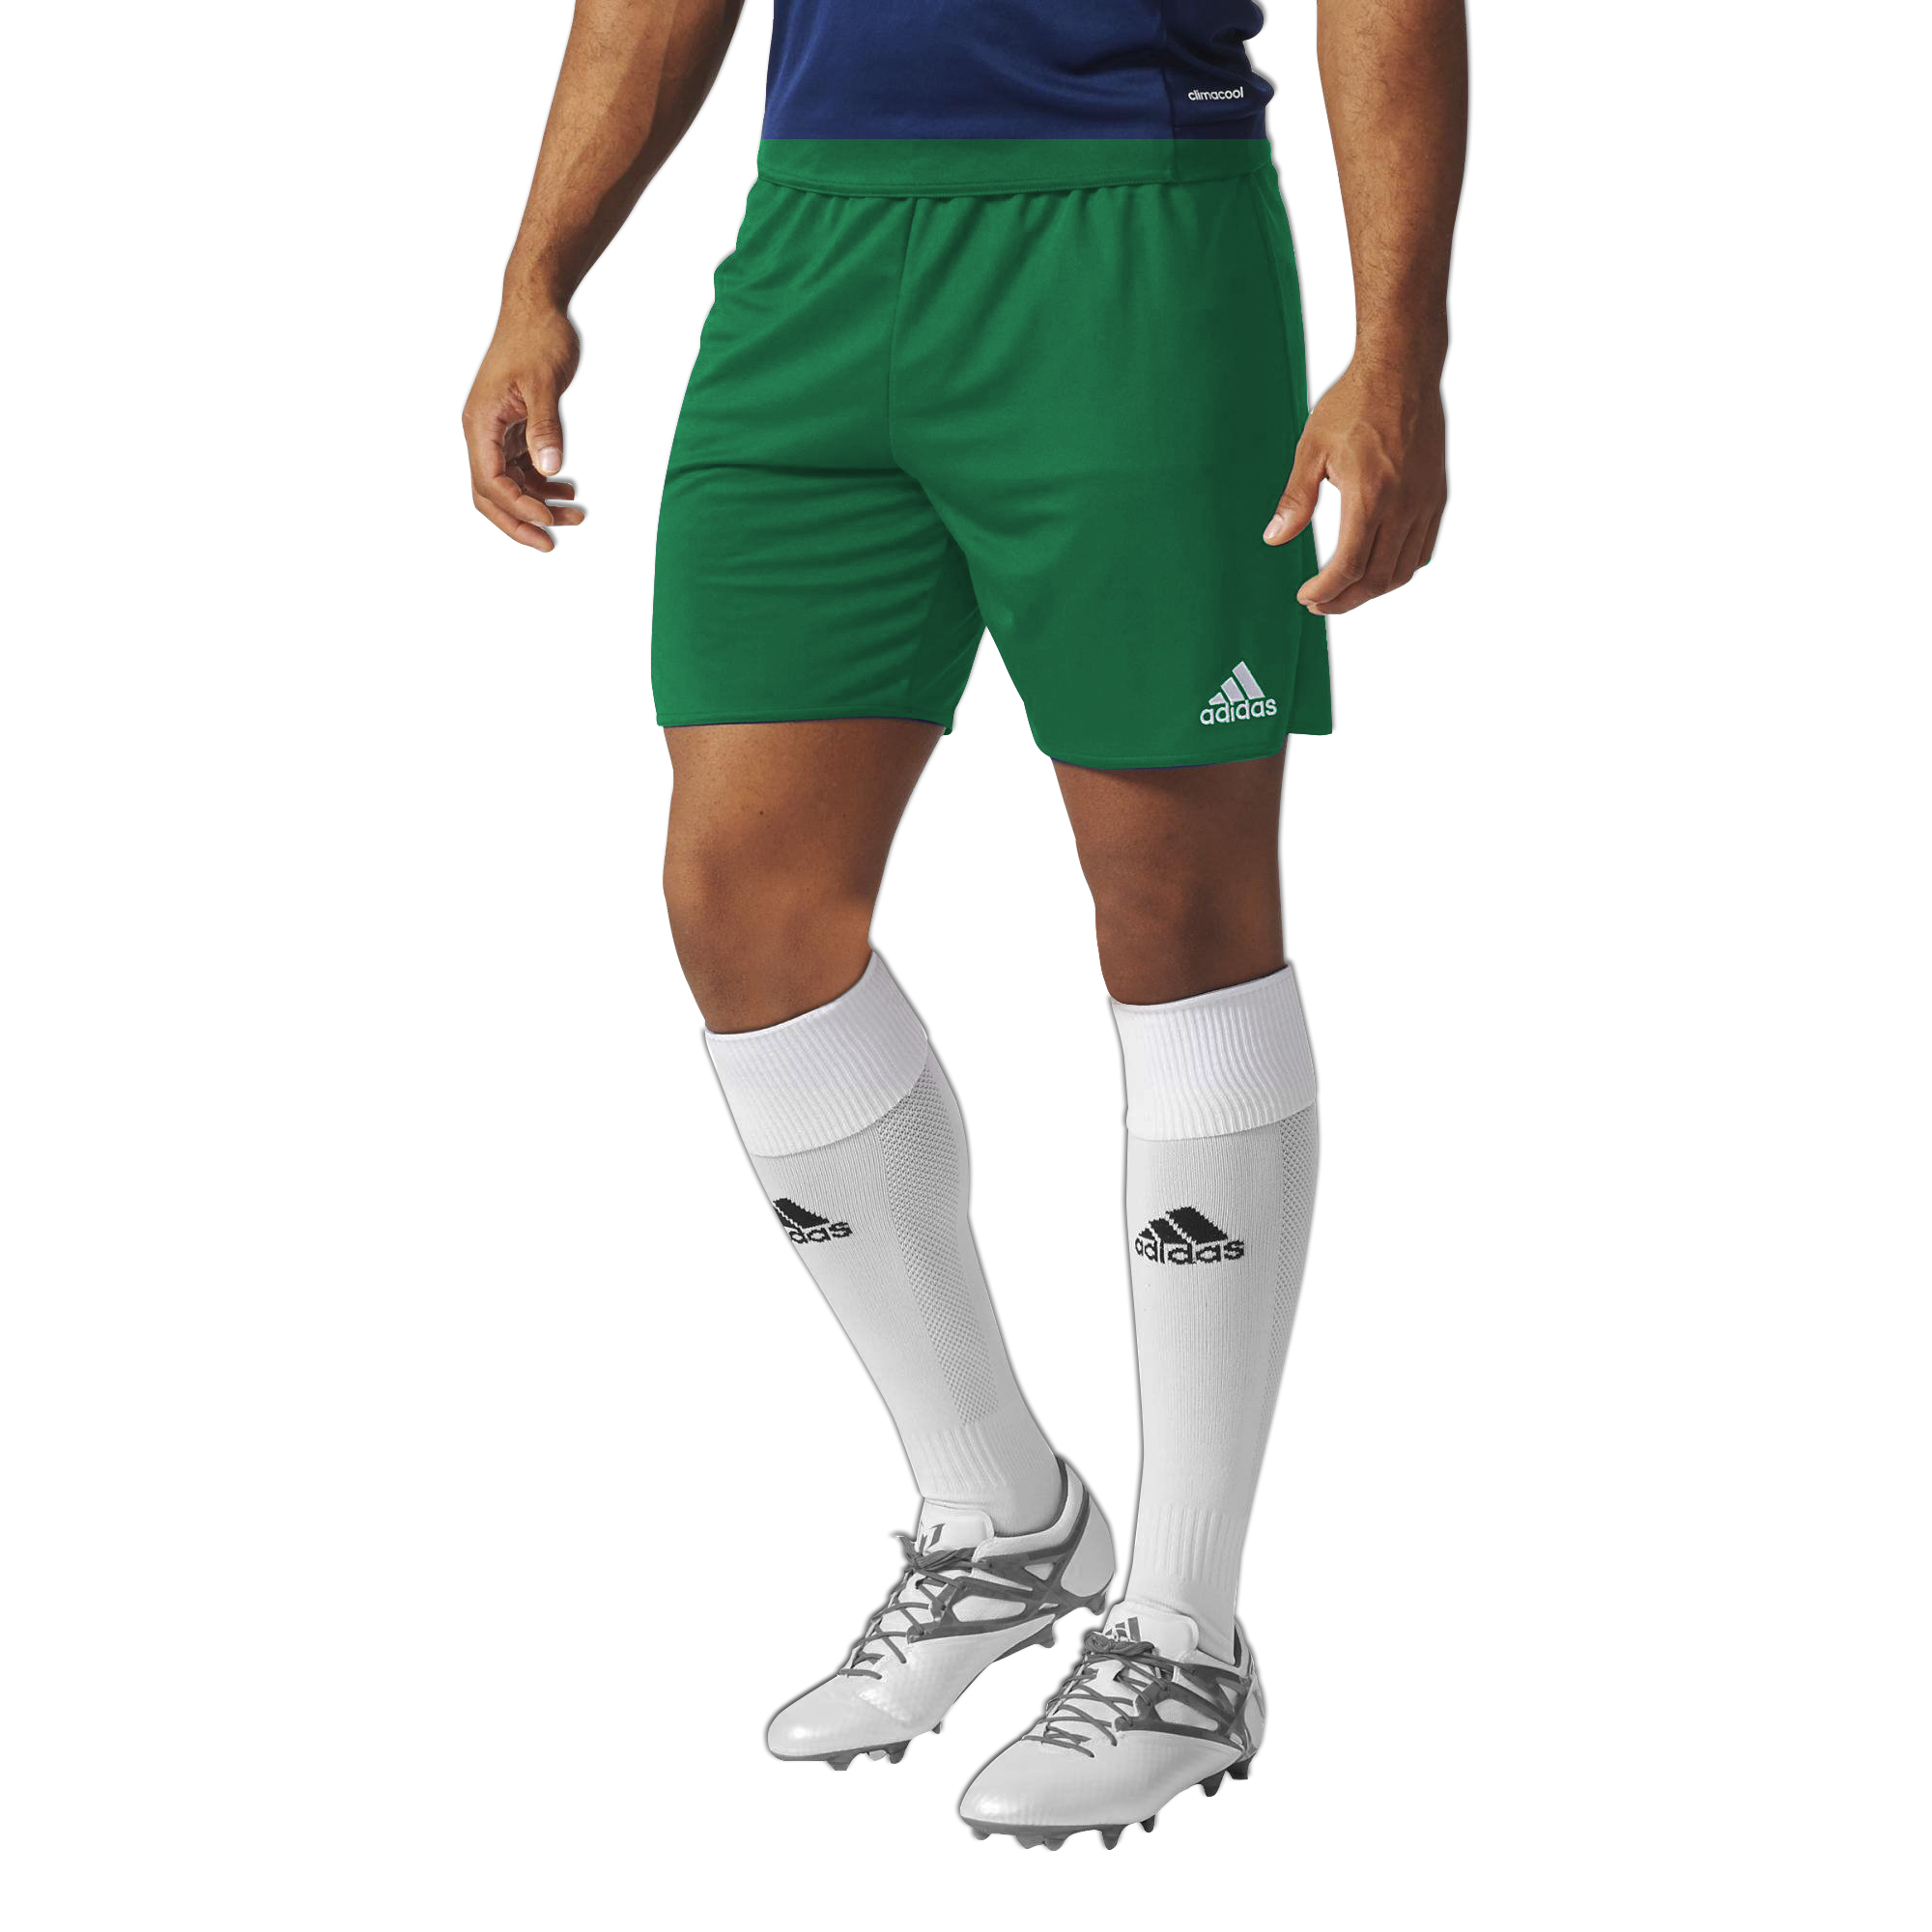 adidas-Men-039-s-Parma-Football-Training-Team-Wear-Shorts-Sport-Casual-Gym-B-Grade thumbnail 16